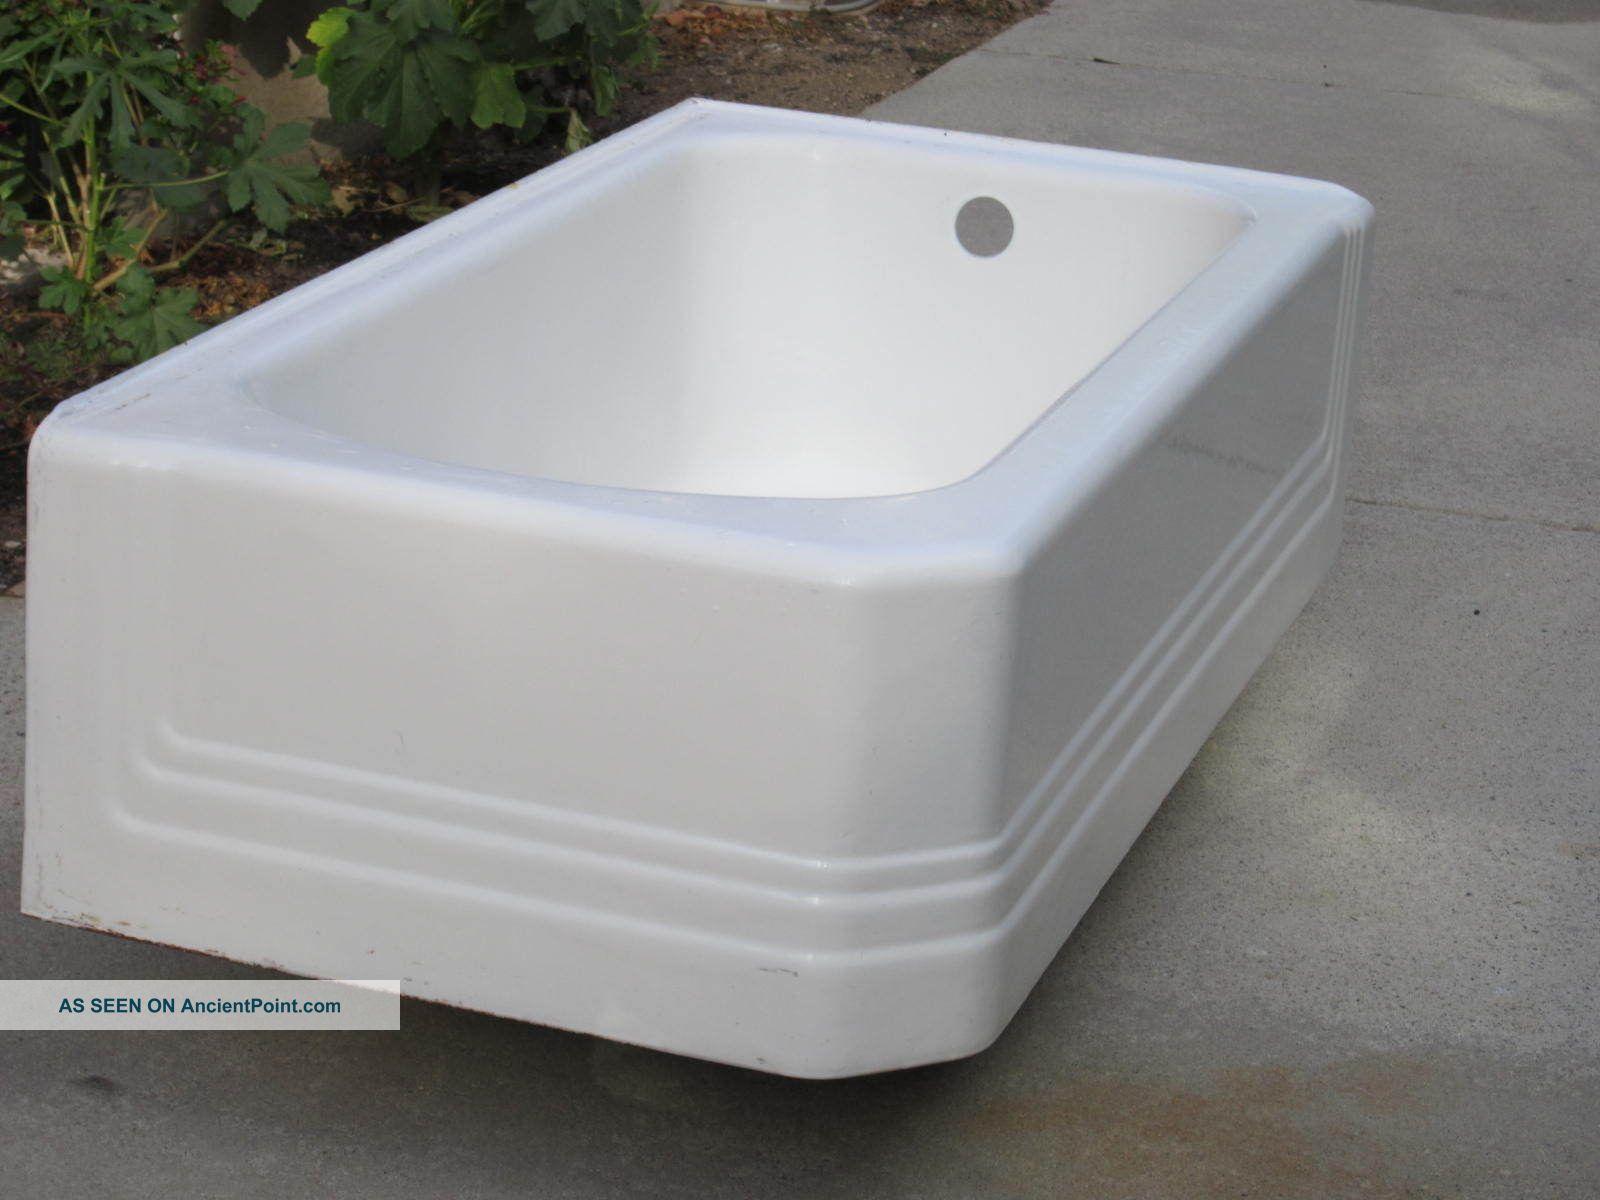 Vintage 1941 Full Skirt American Standard Bath Tub